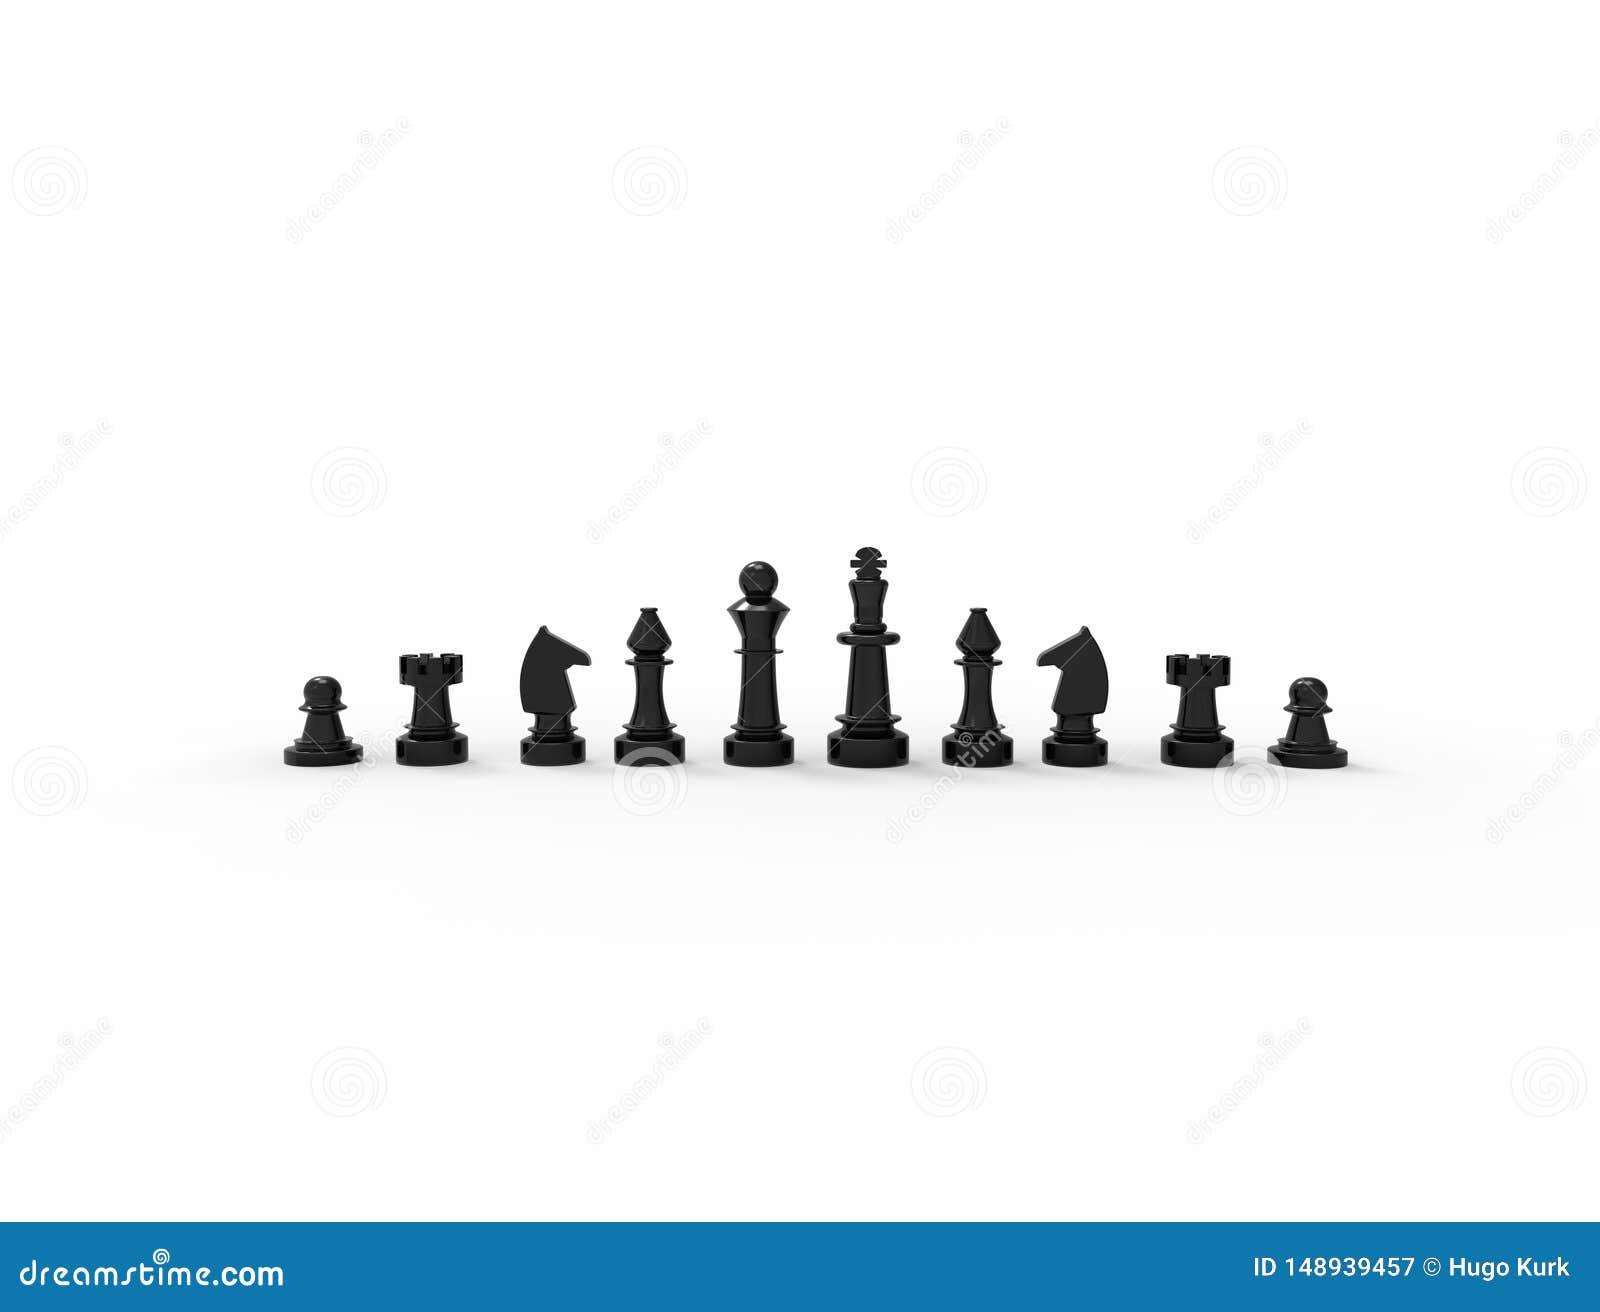 Rendi??o 3D das partes de xadrez pretas isoladas no fundo branco